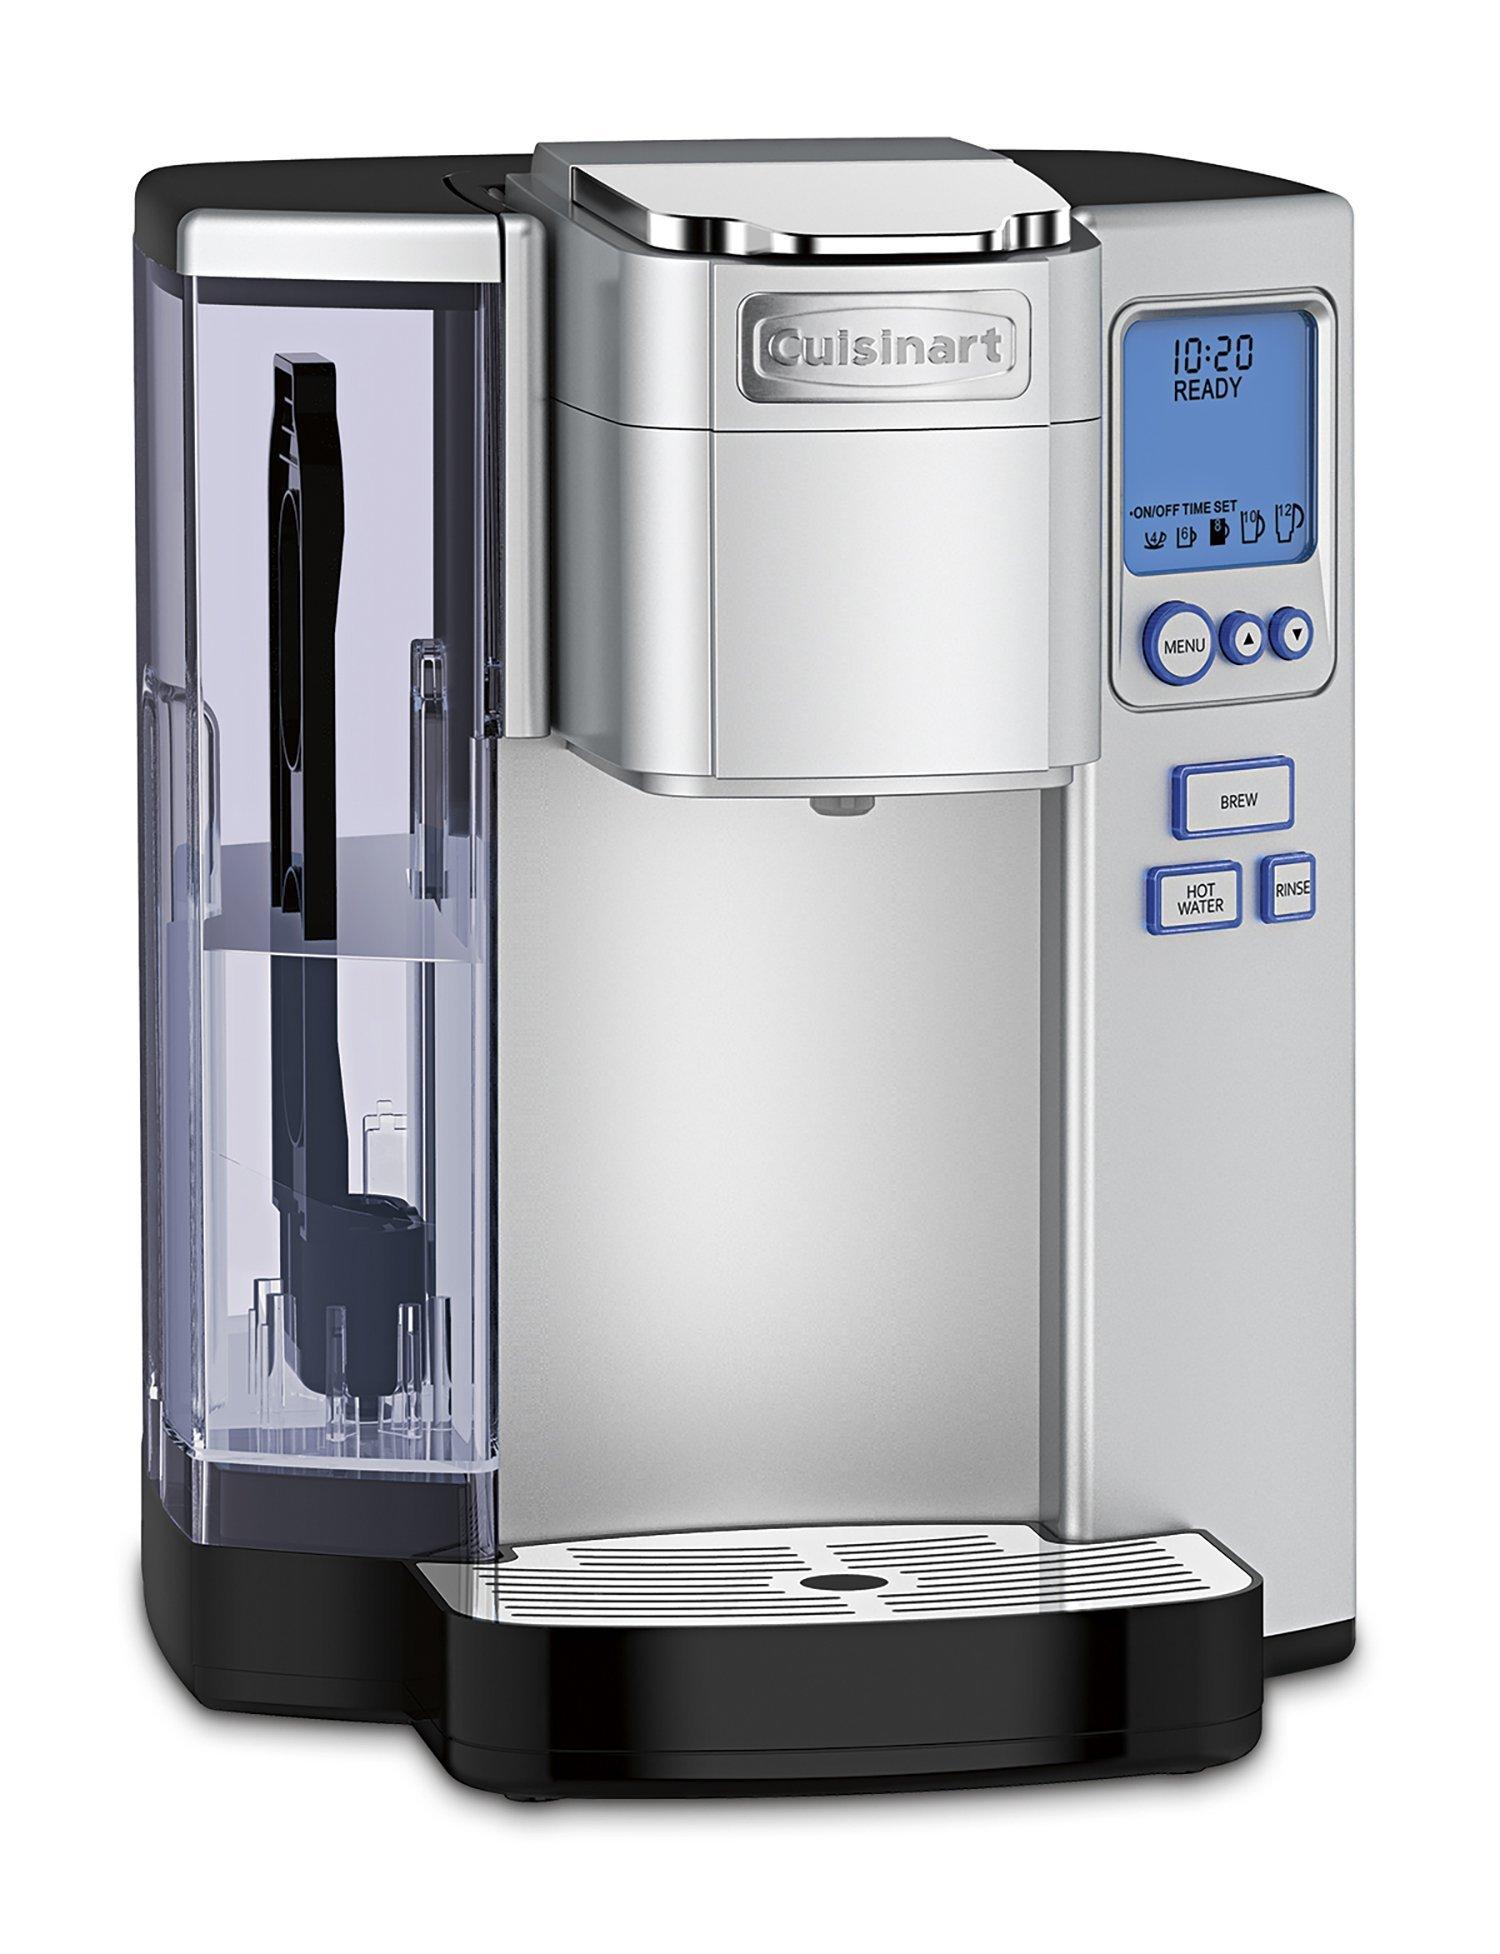 Cuisinart SS 10 Premium Single Serve Coffeemaker